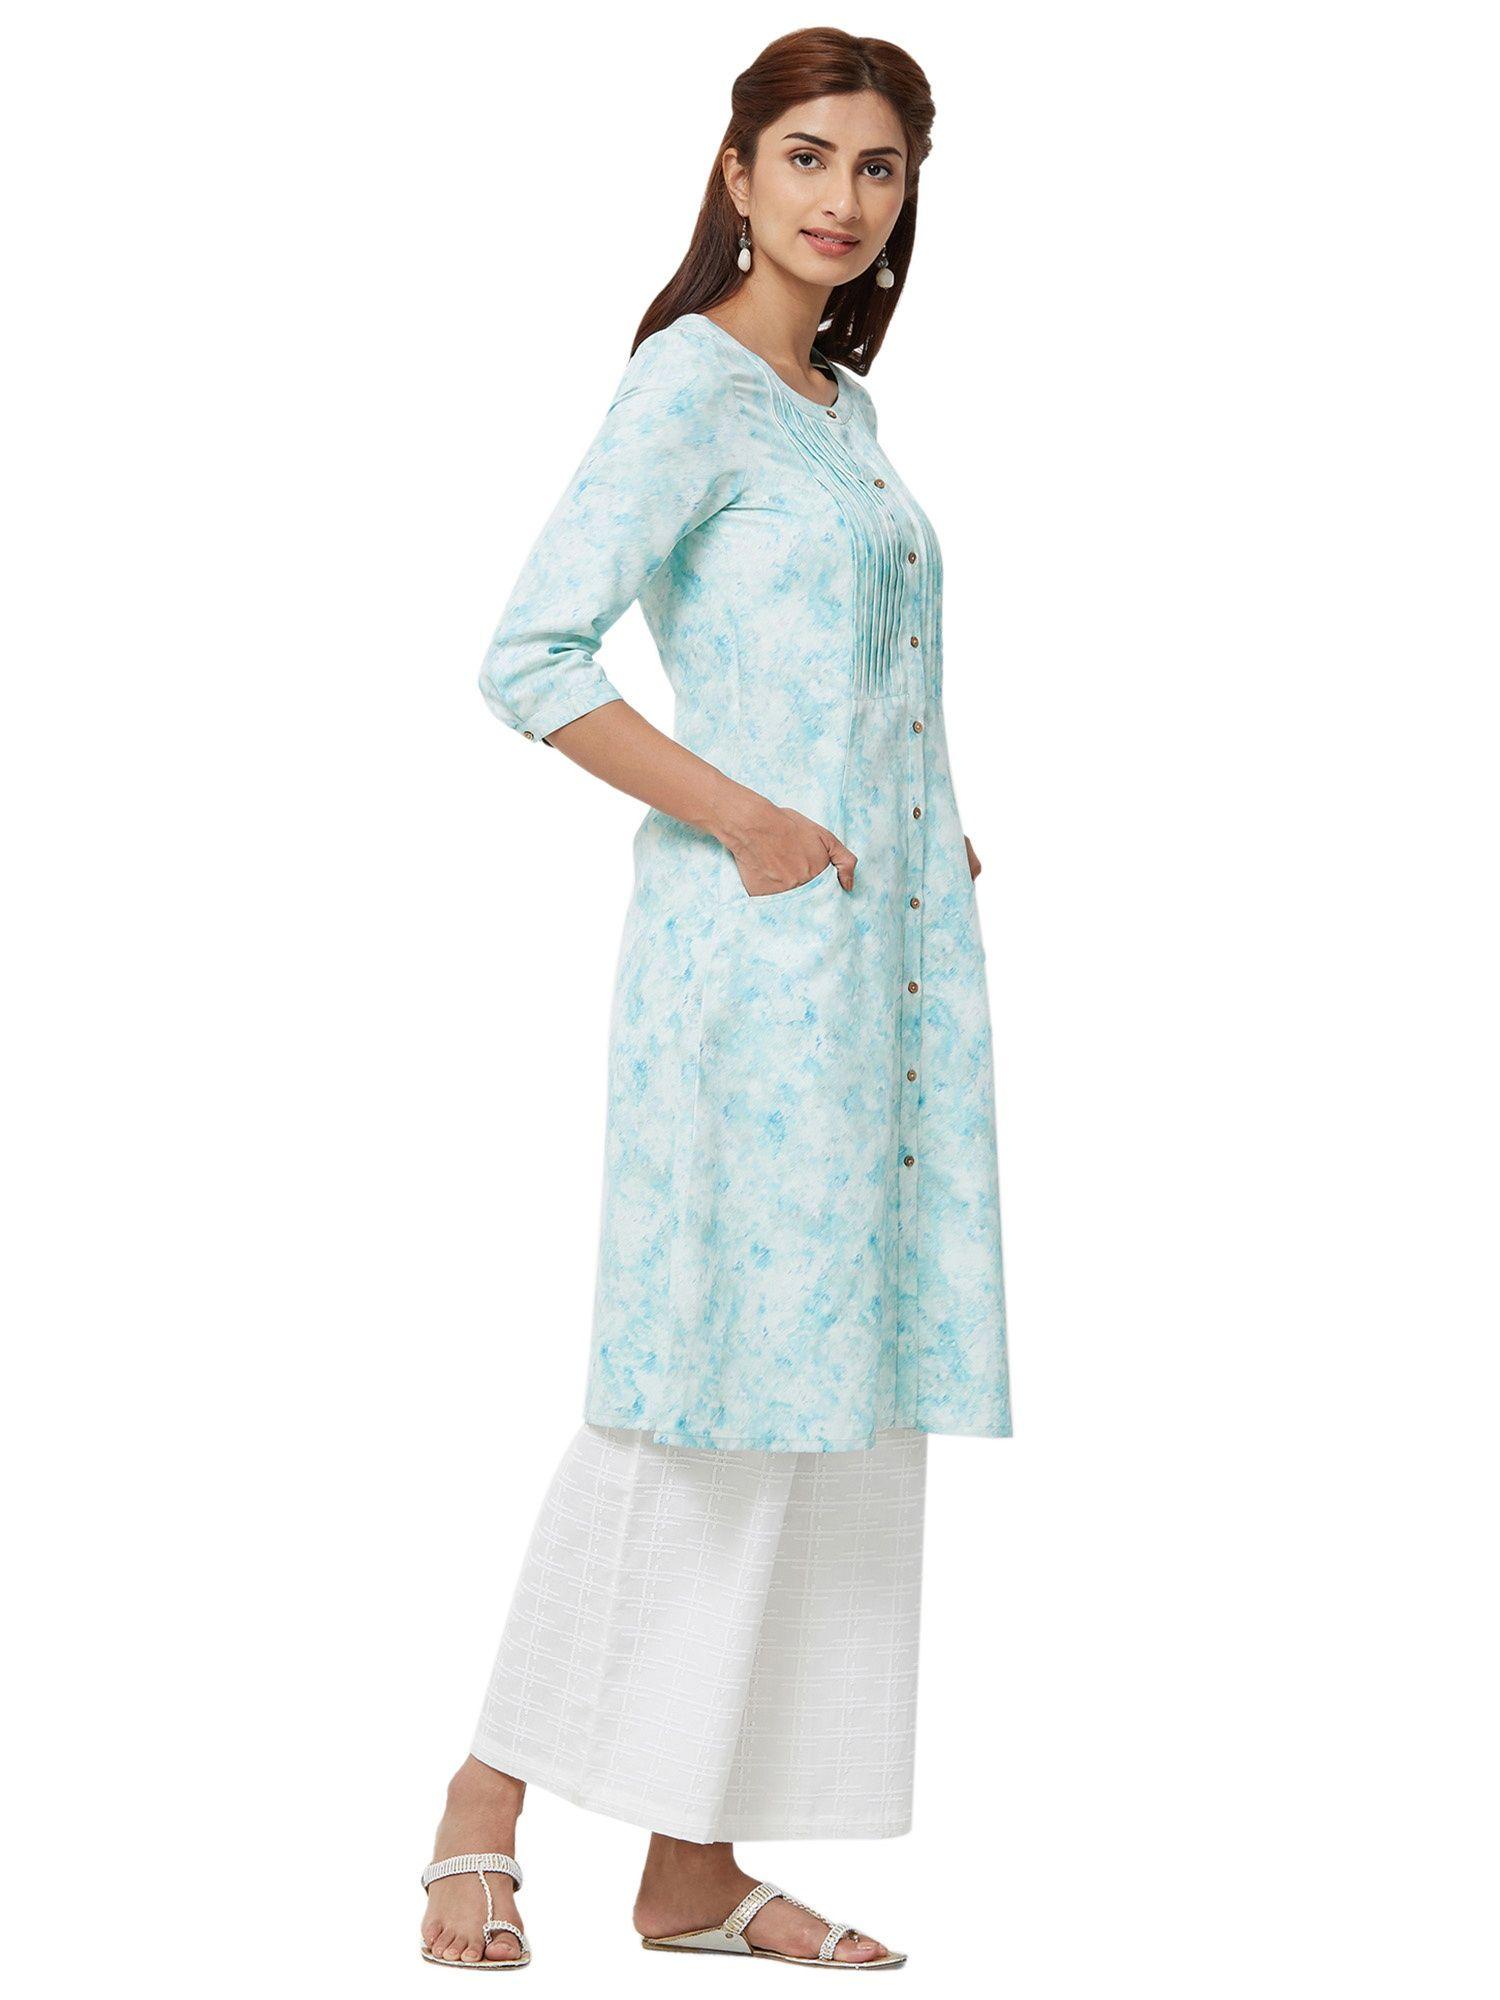 8b8d55134c6 Naari Kurtis Kurtas and Tunics : Buy Naari Light Green 3/4th Sleeve ...